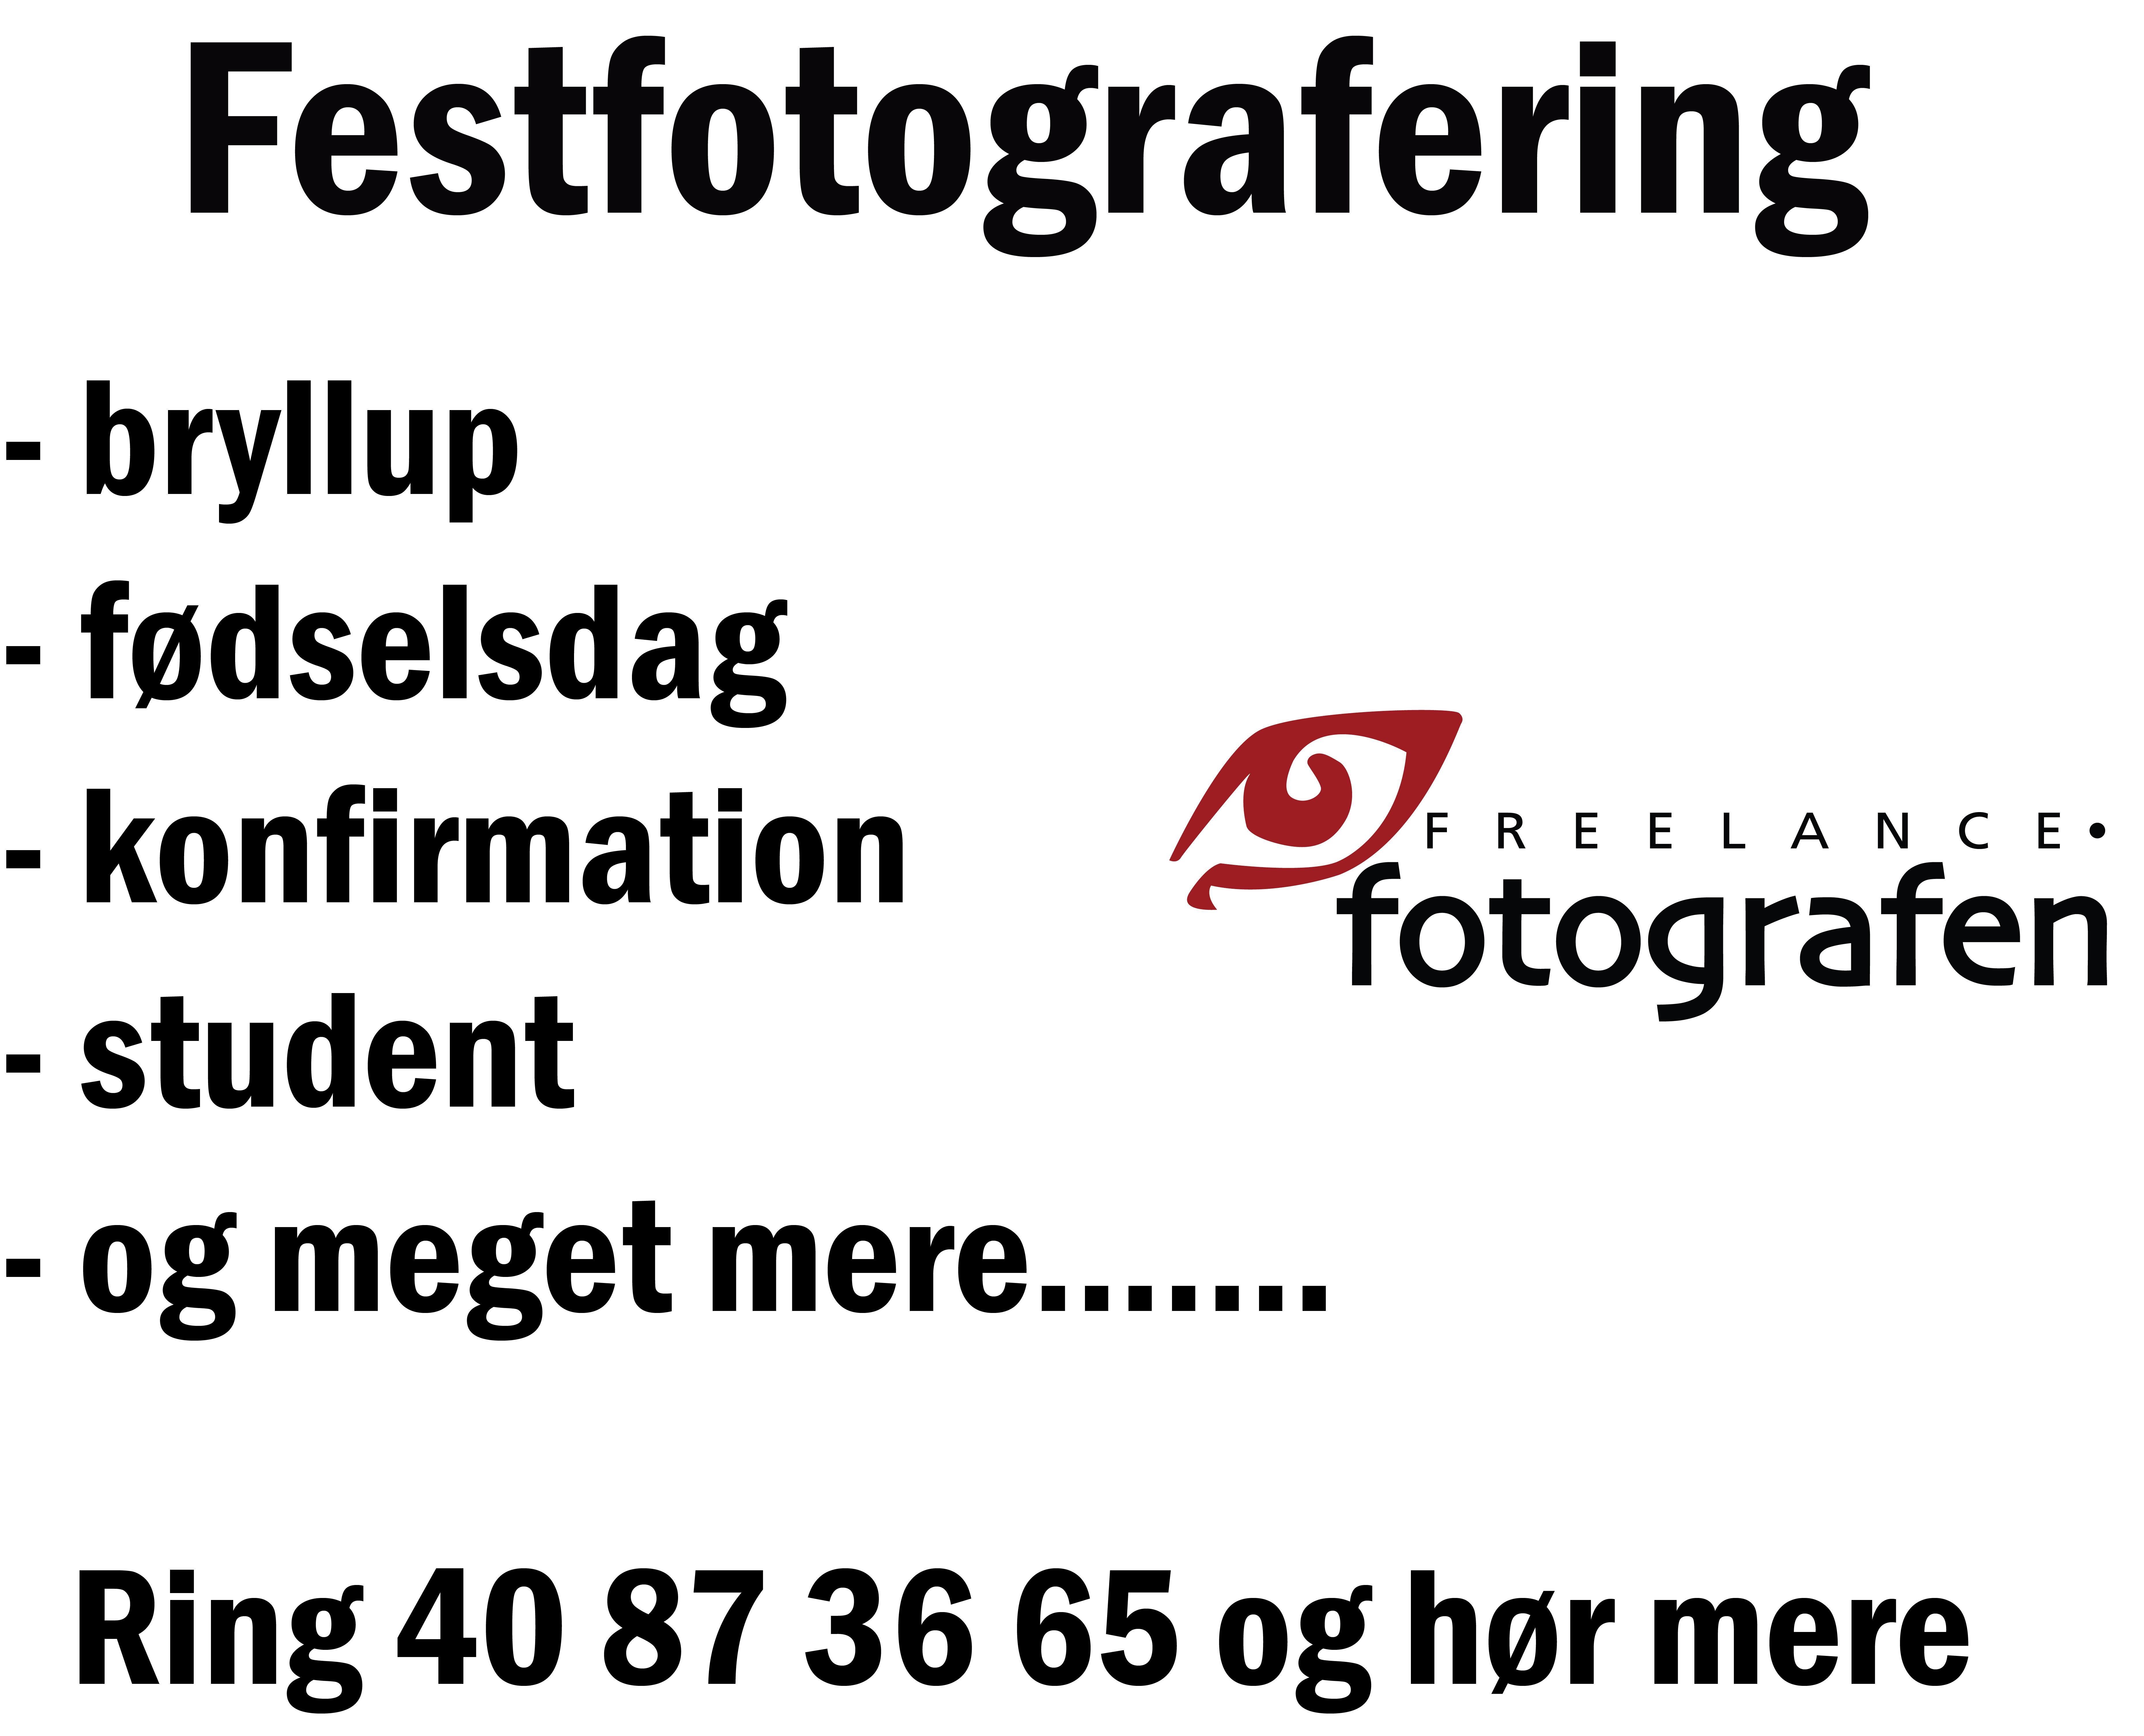 NETAVISANNONCE01-kbg15022019